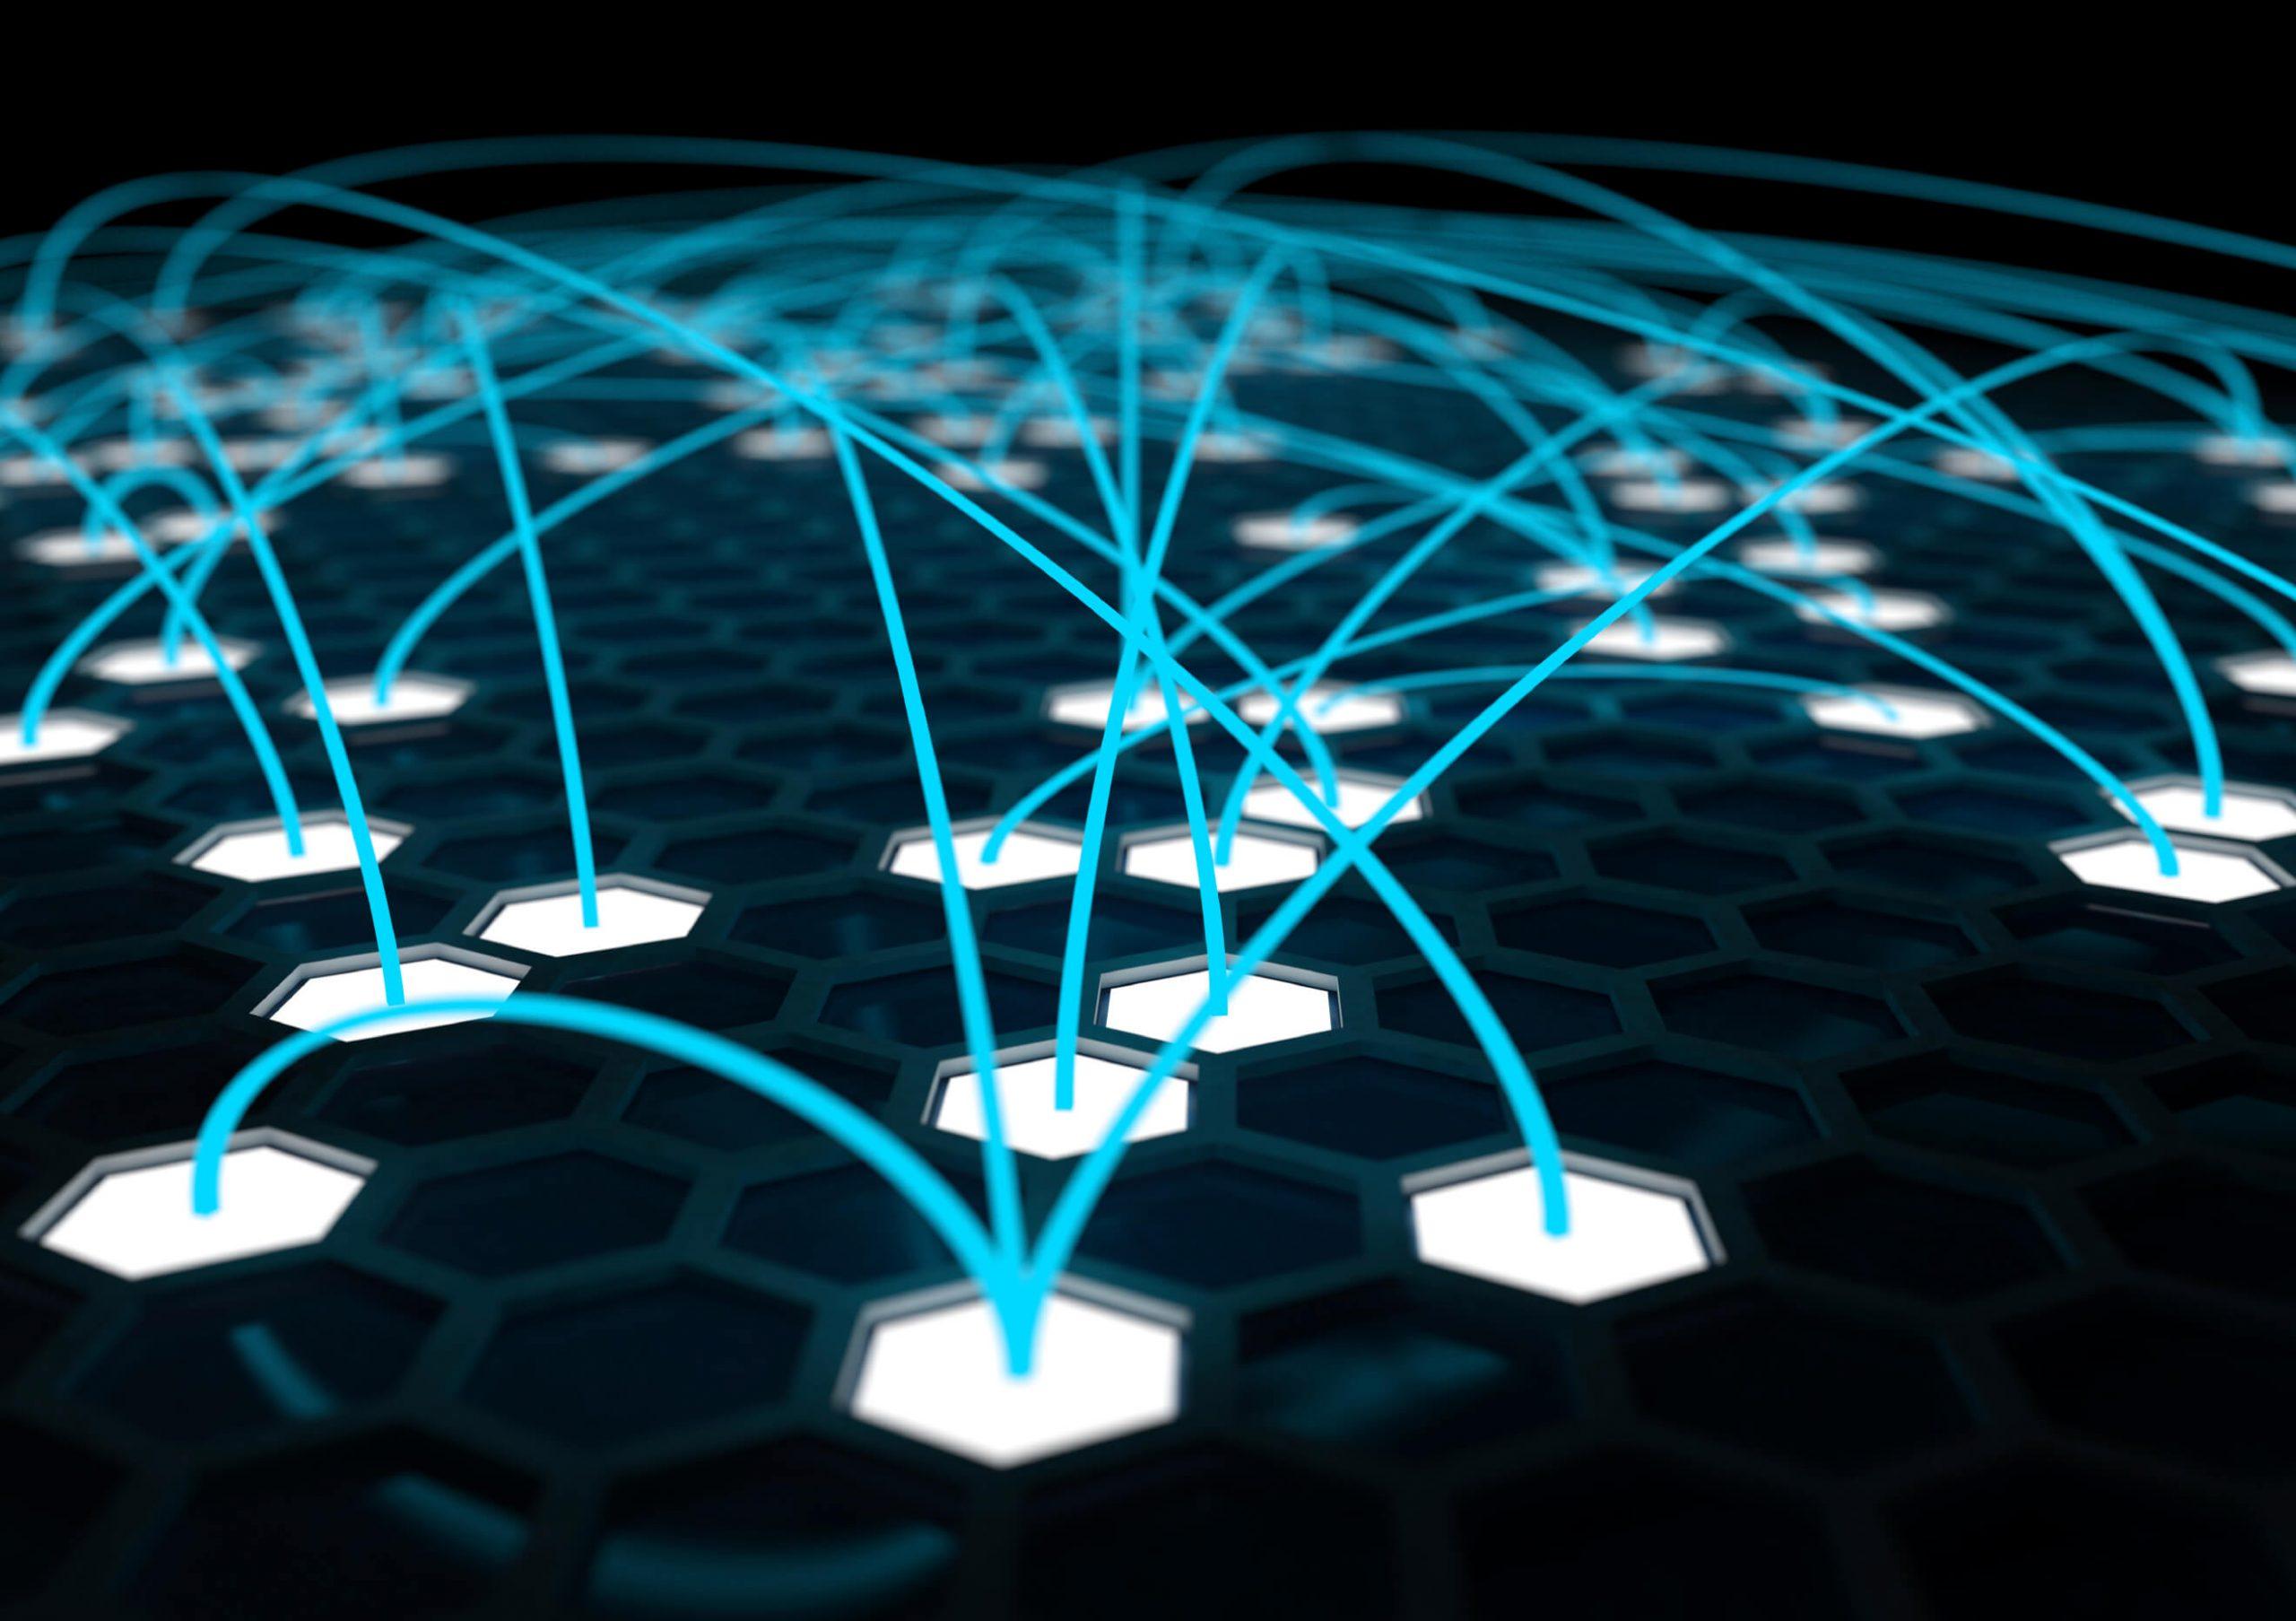 Blockchain Teknolojisinin Kullanımı 1 - Blockchain Teknolojisi scaled